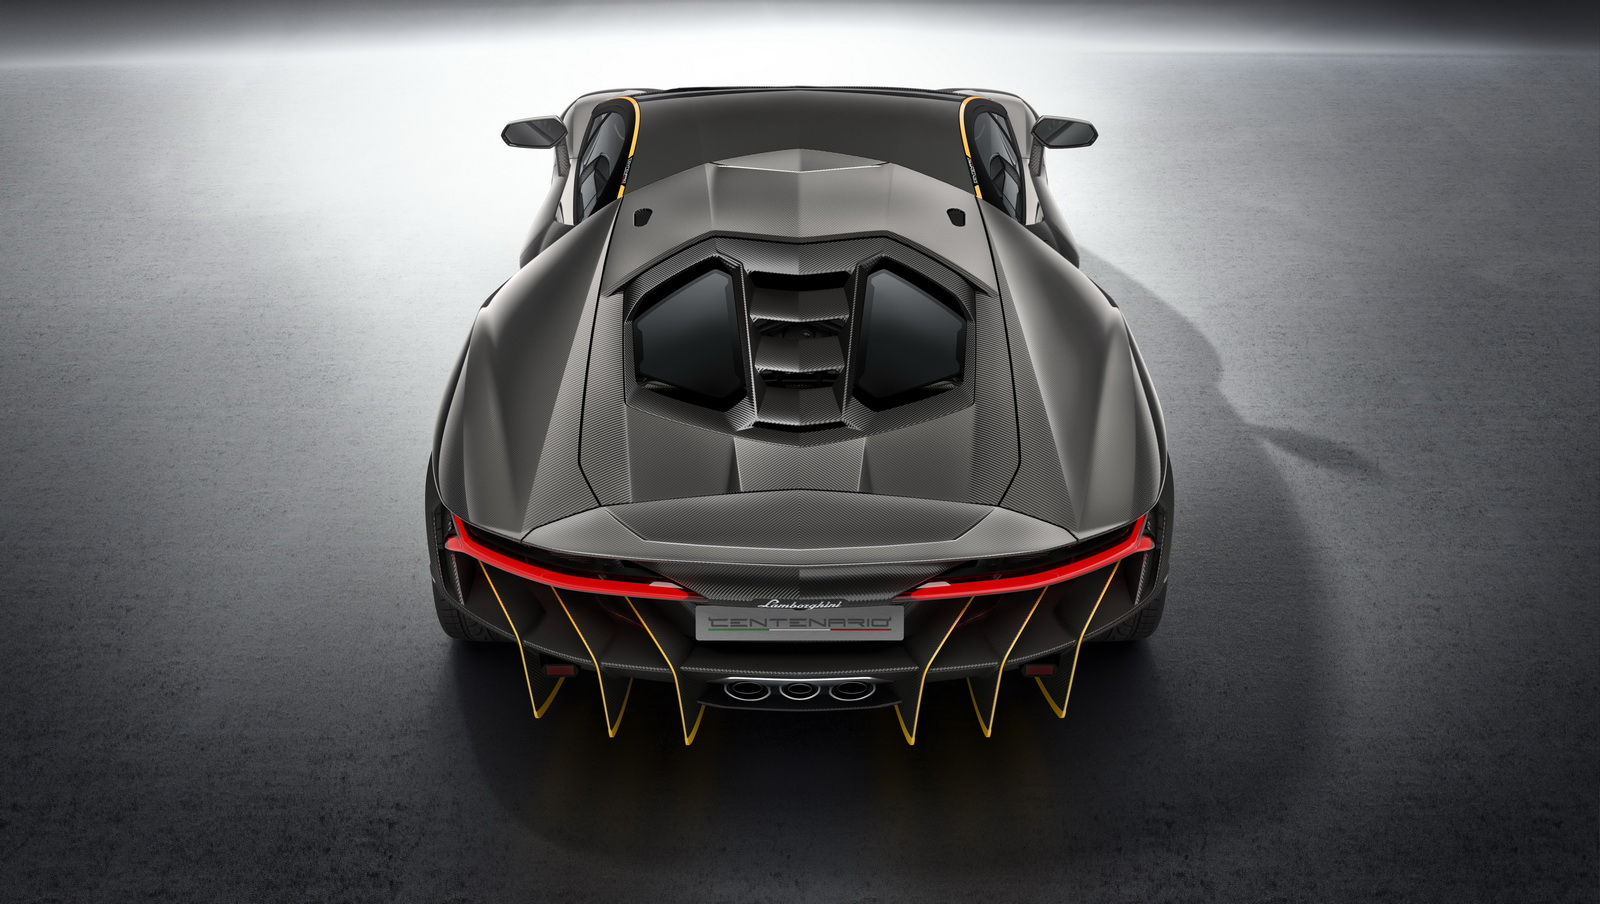 Siêu xe Lamborghini Centenario 2017